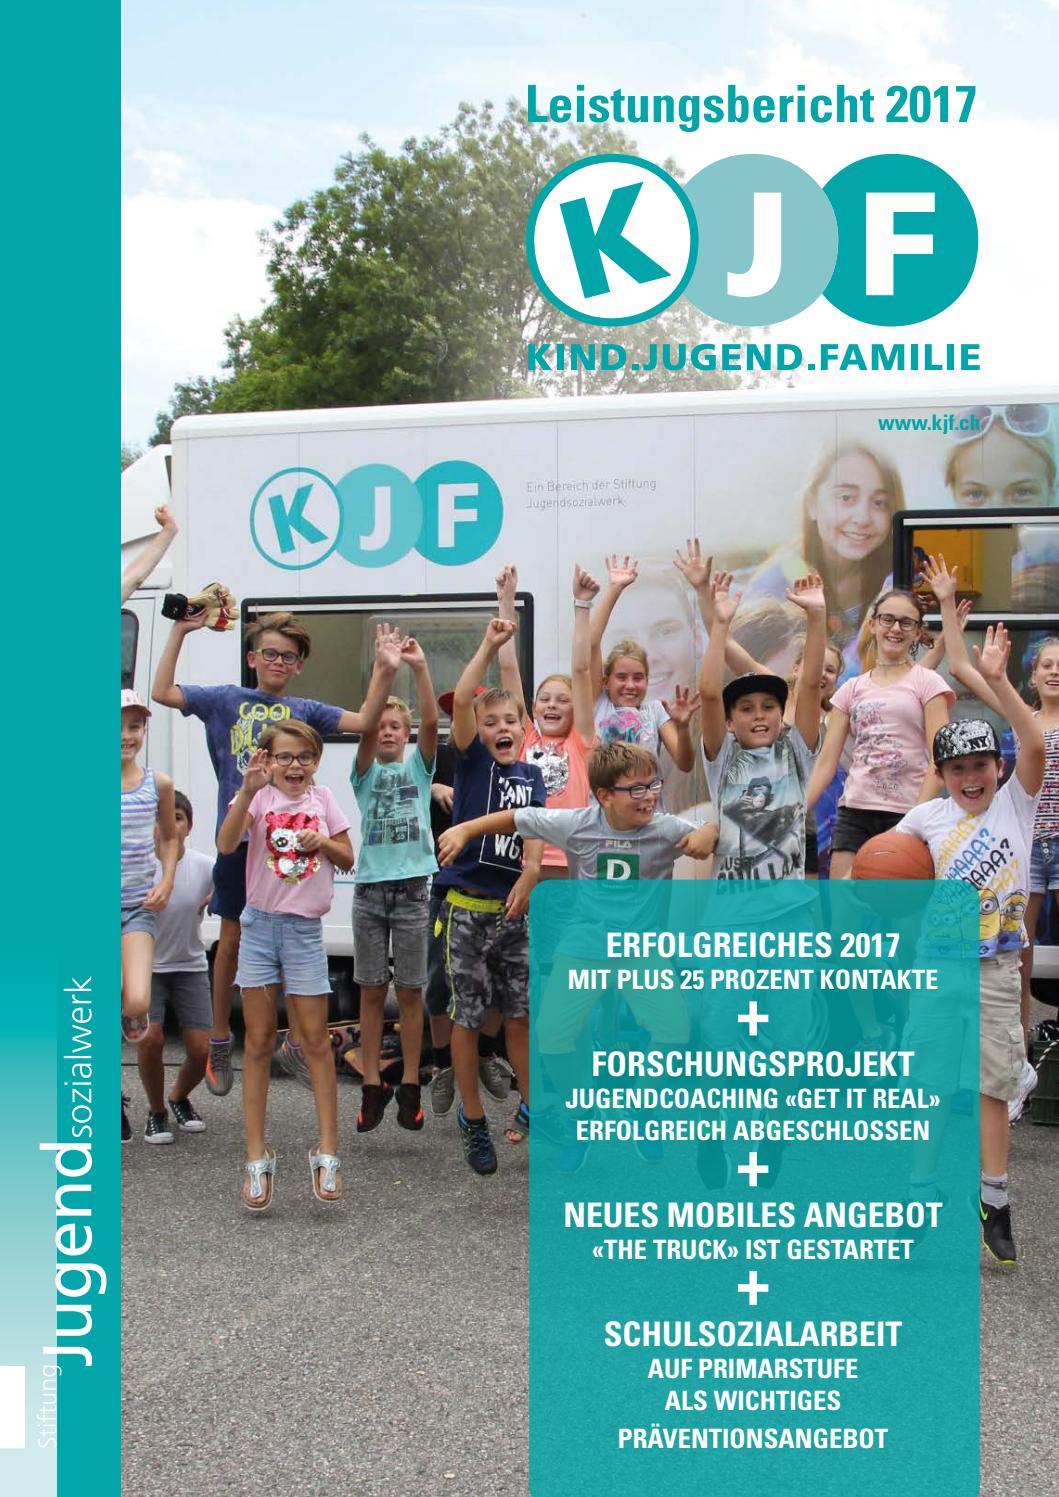 Leistungsbericht Kind Jugend Familie KJF 2017 by Thomas Furrer - issuu